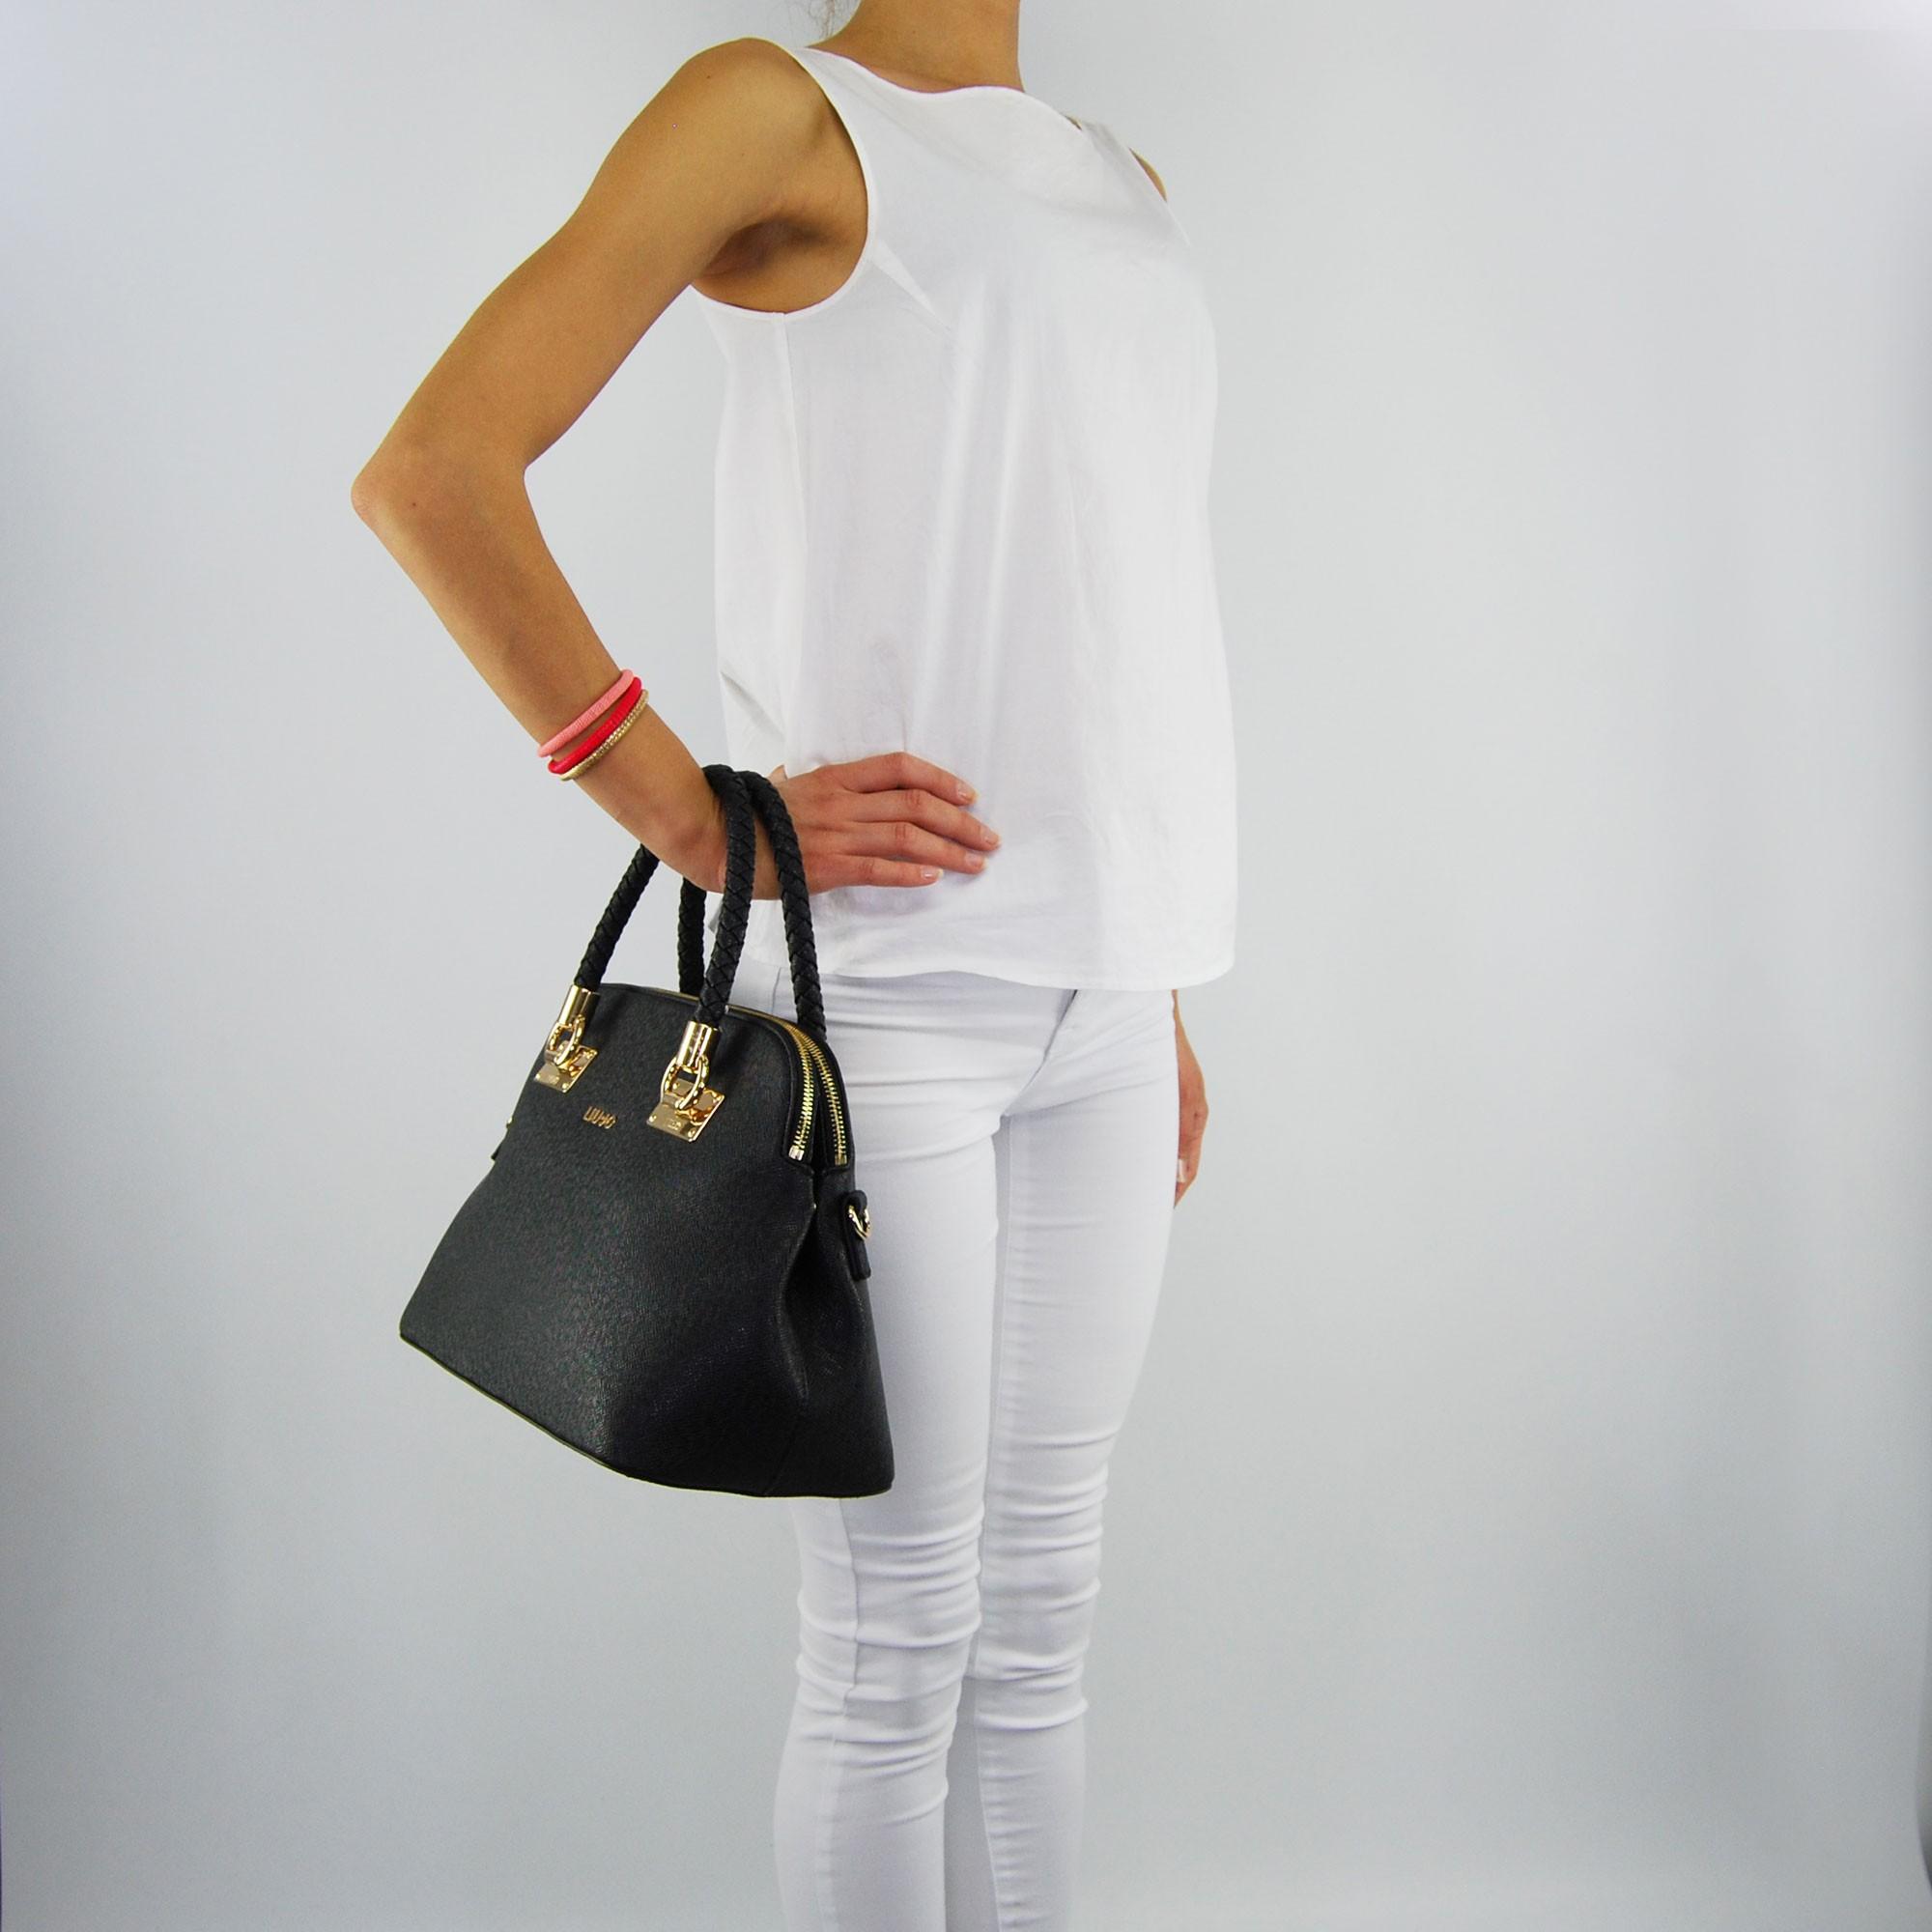 Shopping bag Liu Jo m anna two compartments black 9c701584597